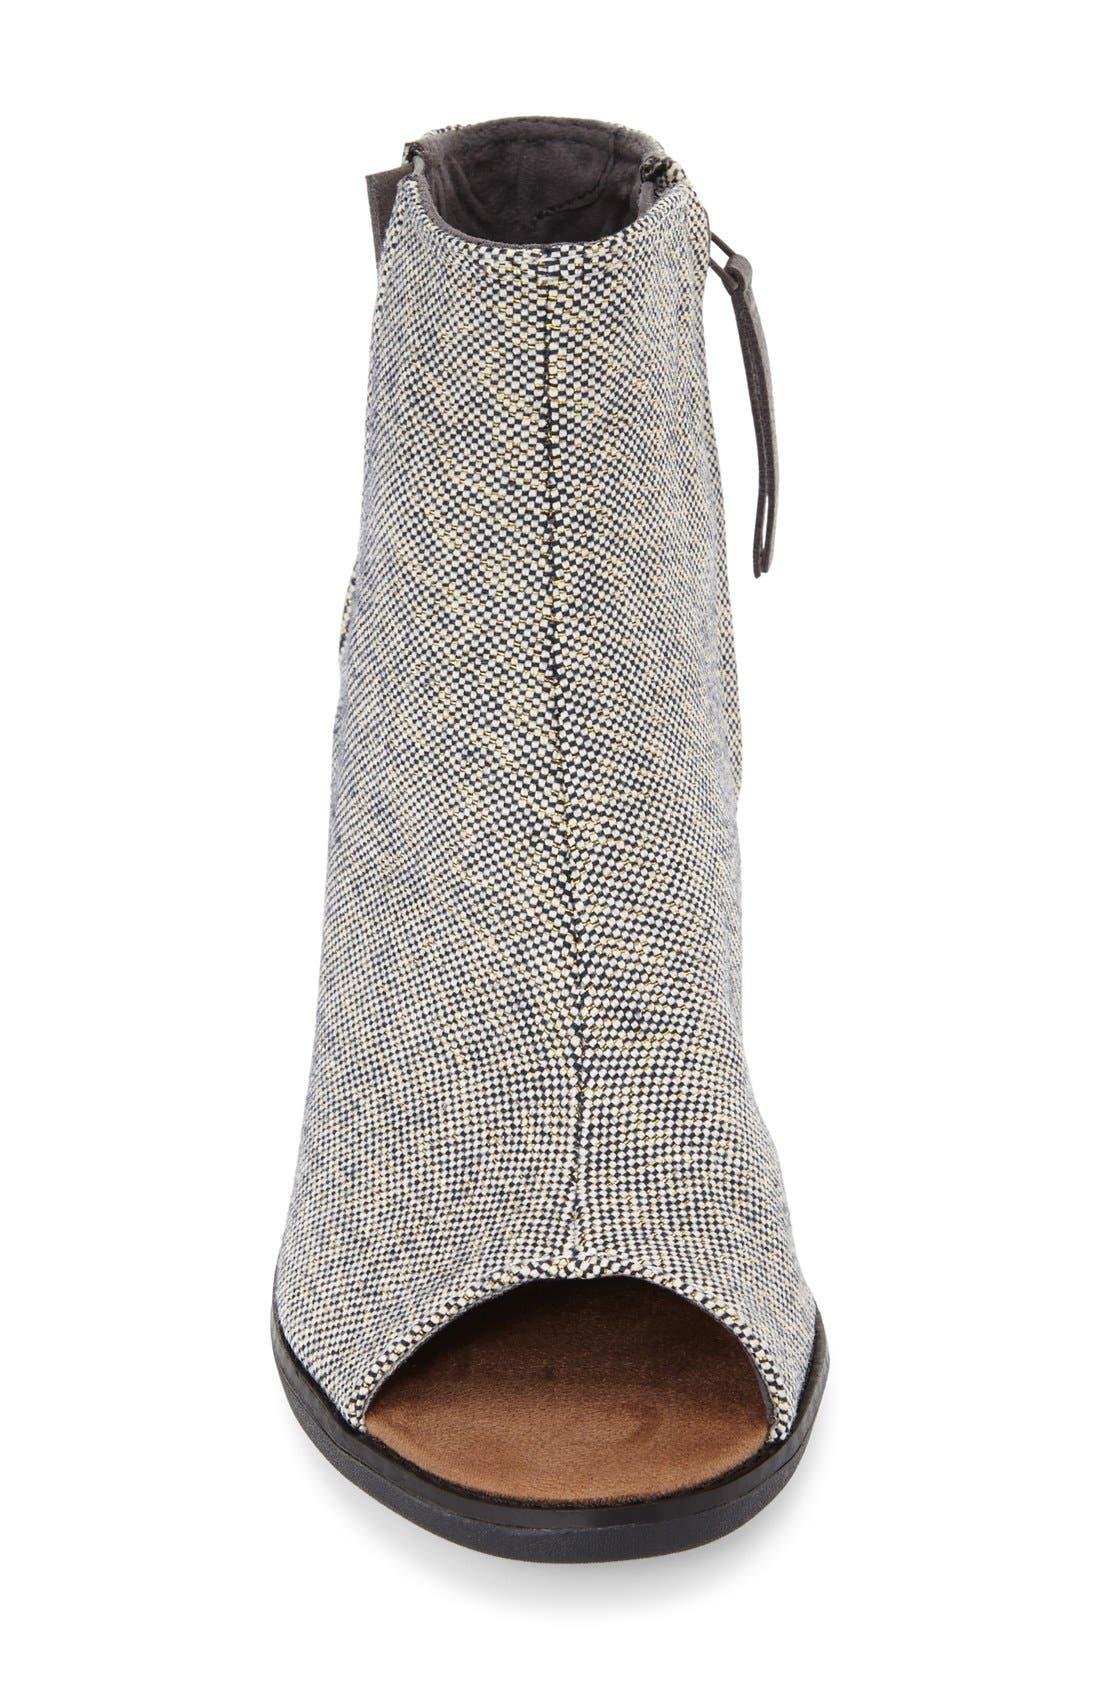 Alternate Image 3  - TOMS 'Majorca' Metallic Peep Toe Bootie (Women)